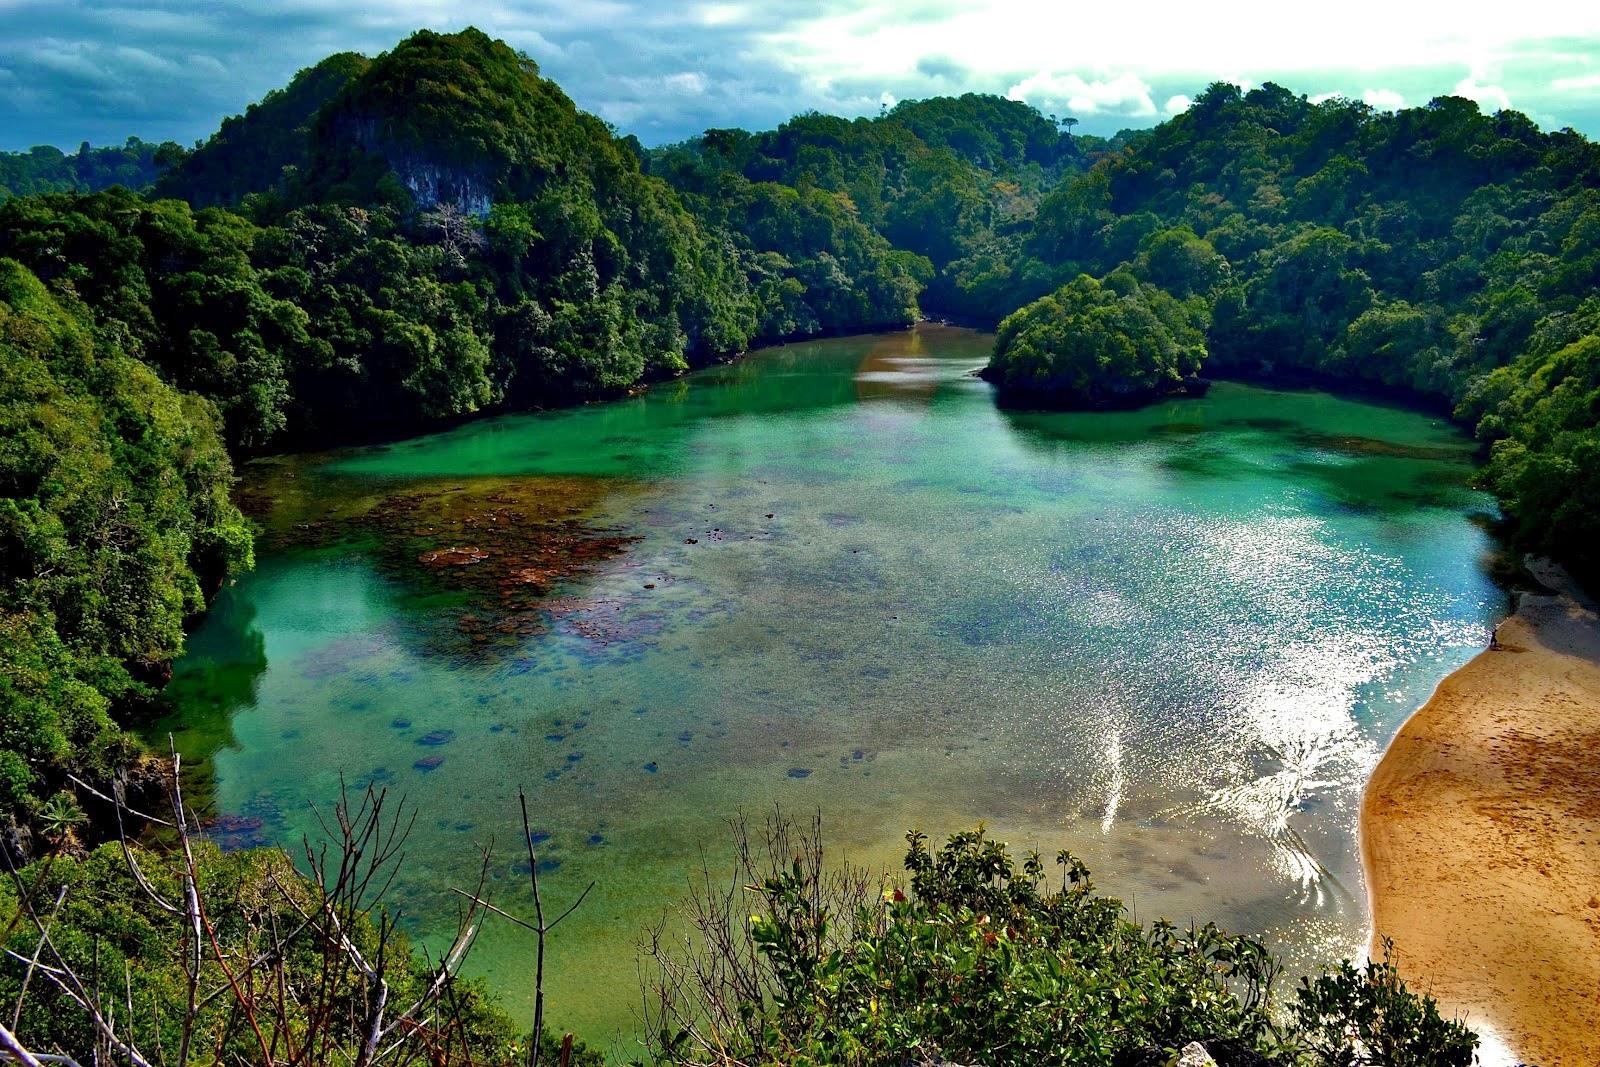 Tempat Wisata di Malang, Surabaya Jawa Timur